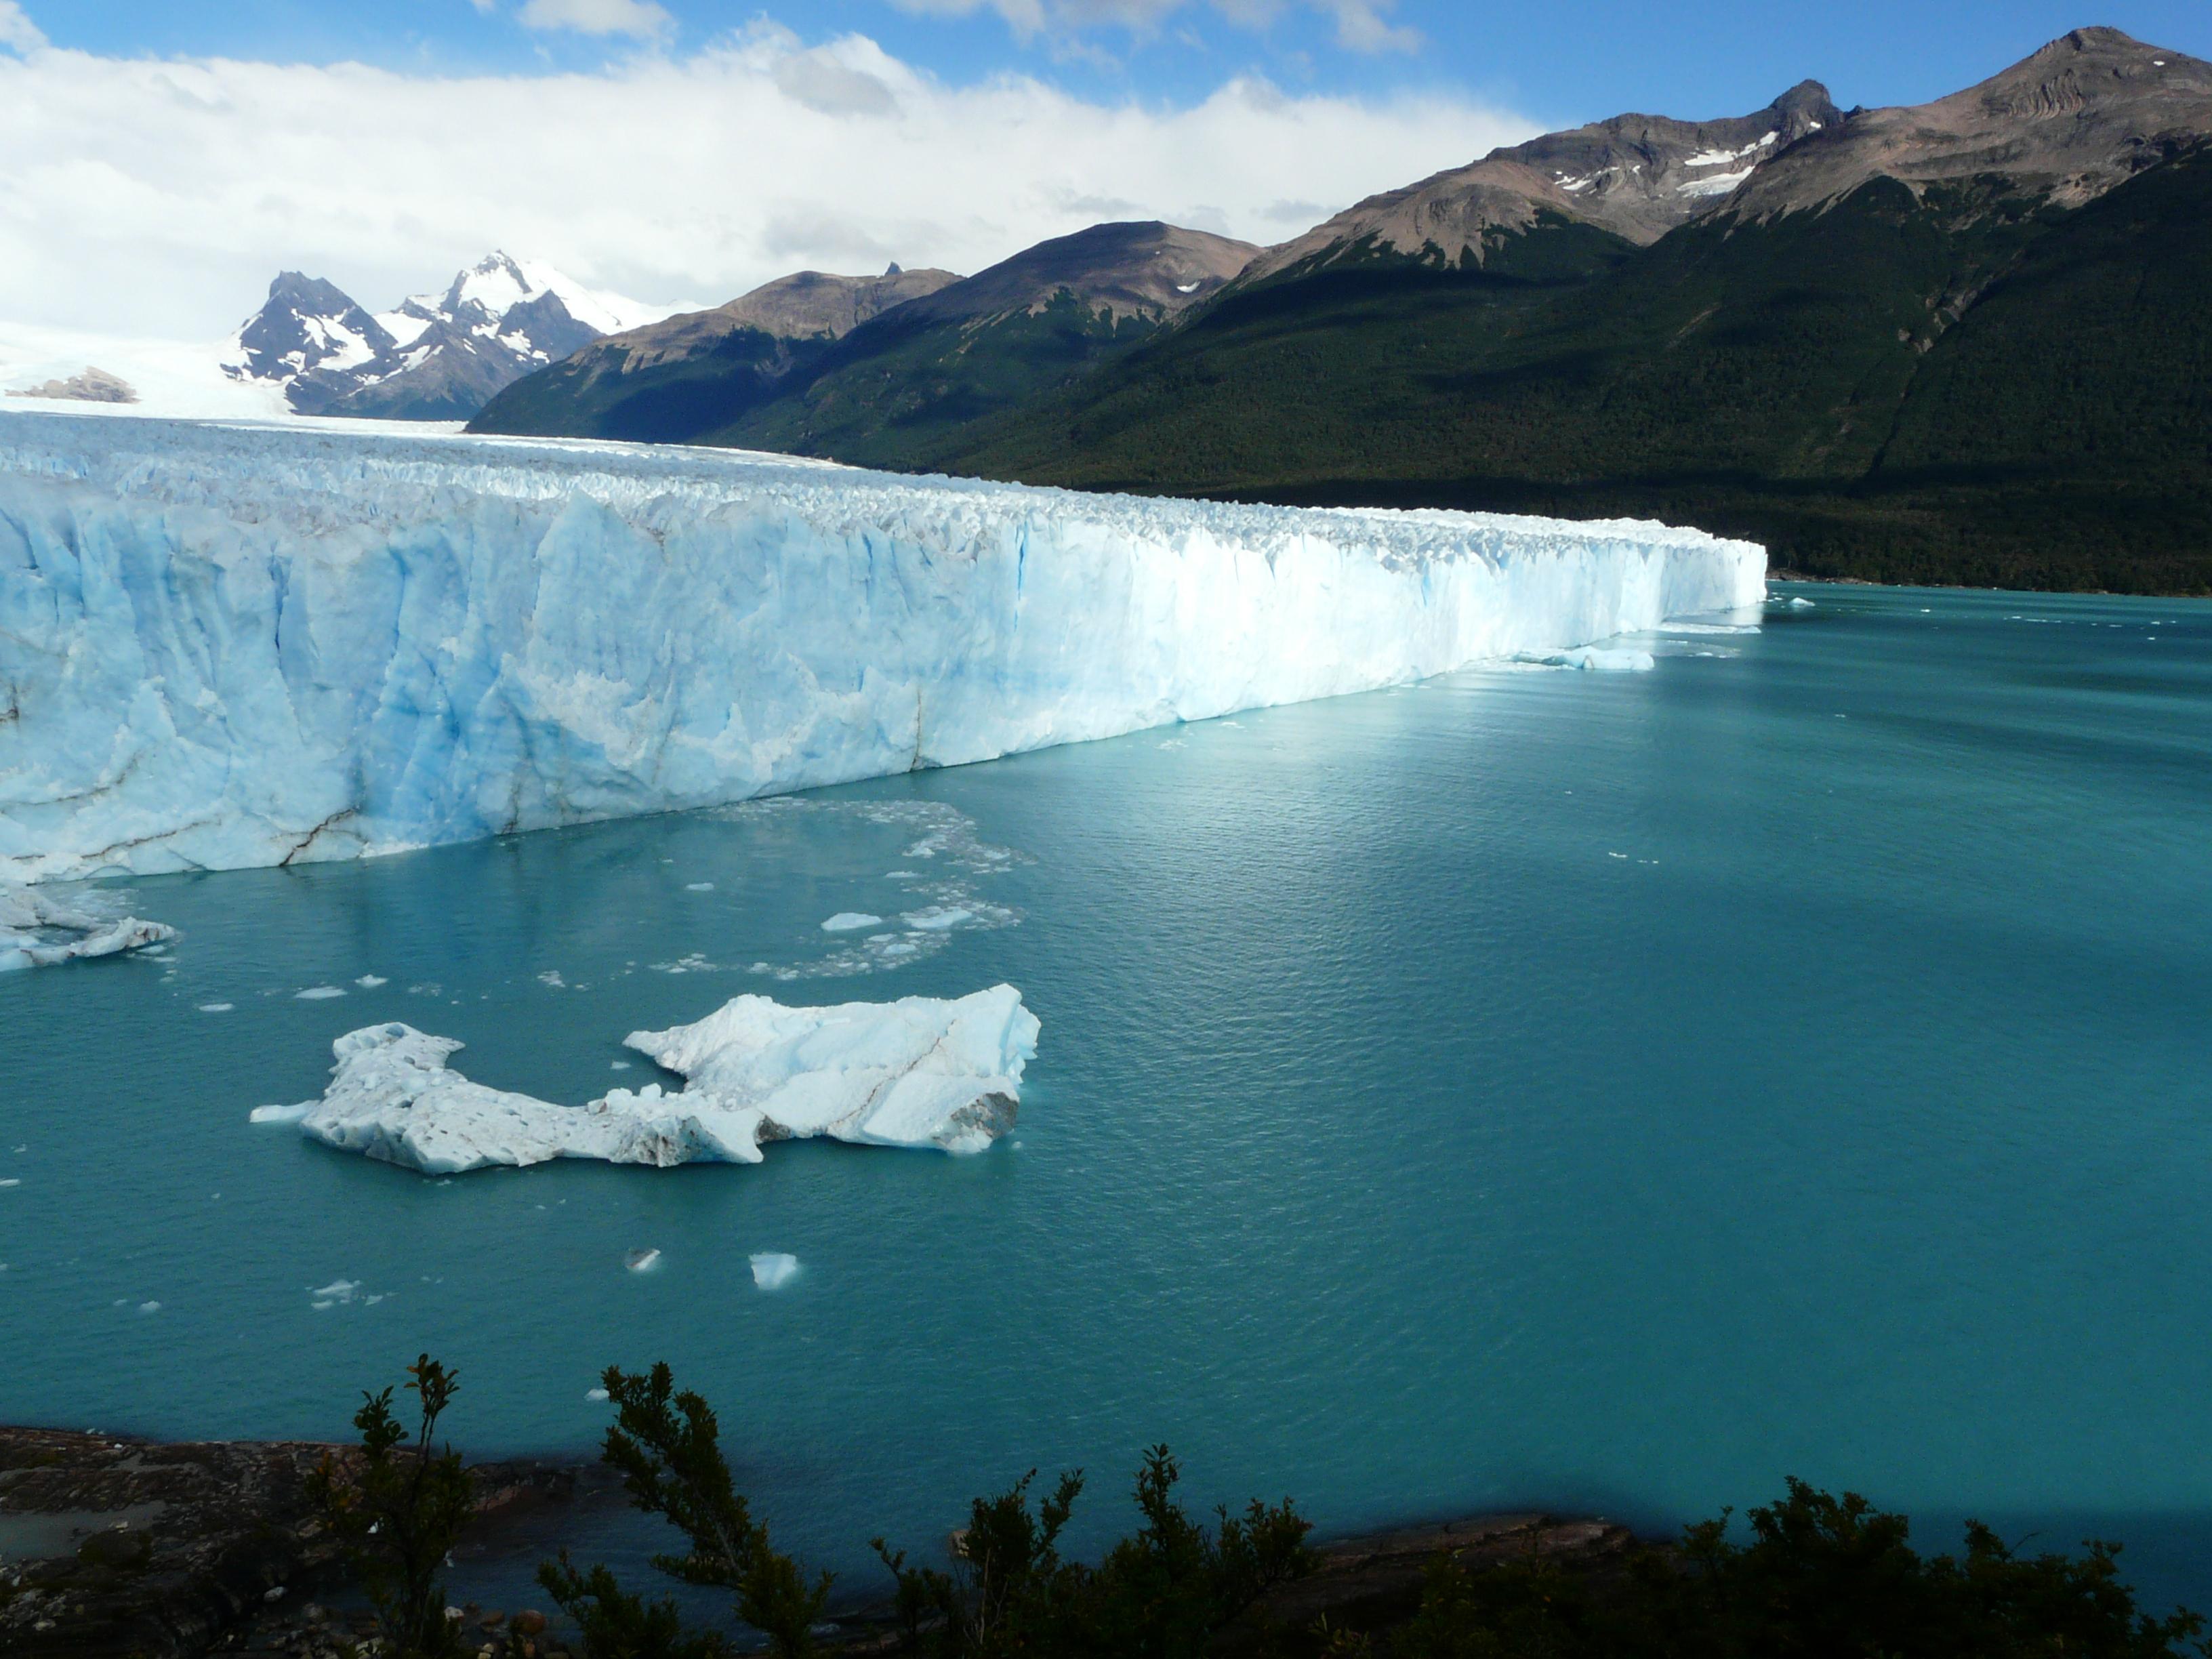 Patagonia South America >> File:South America - Patagonia (6038746074).jpg